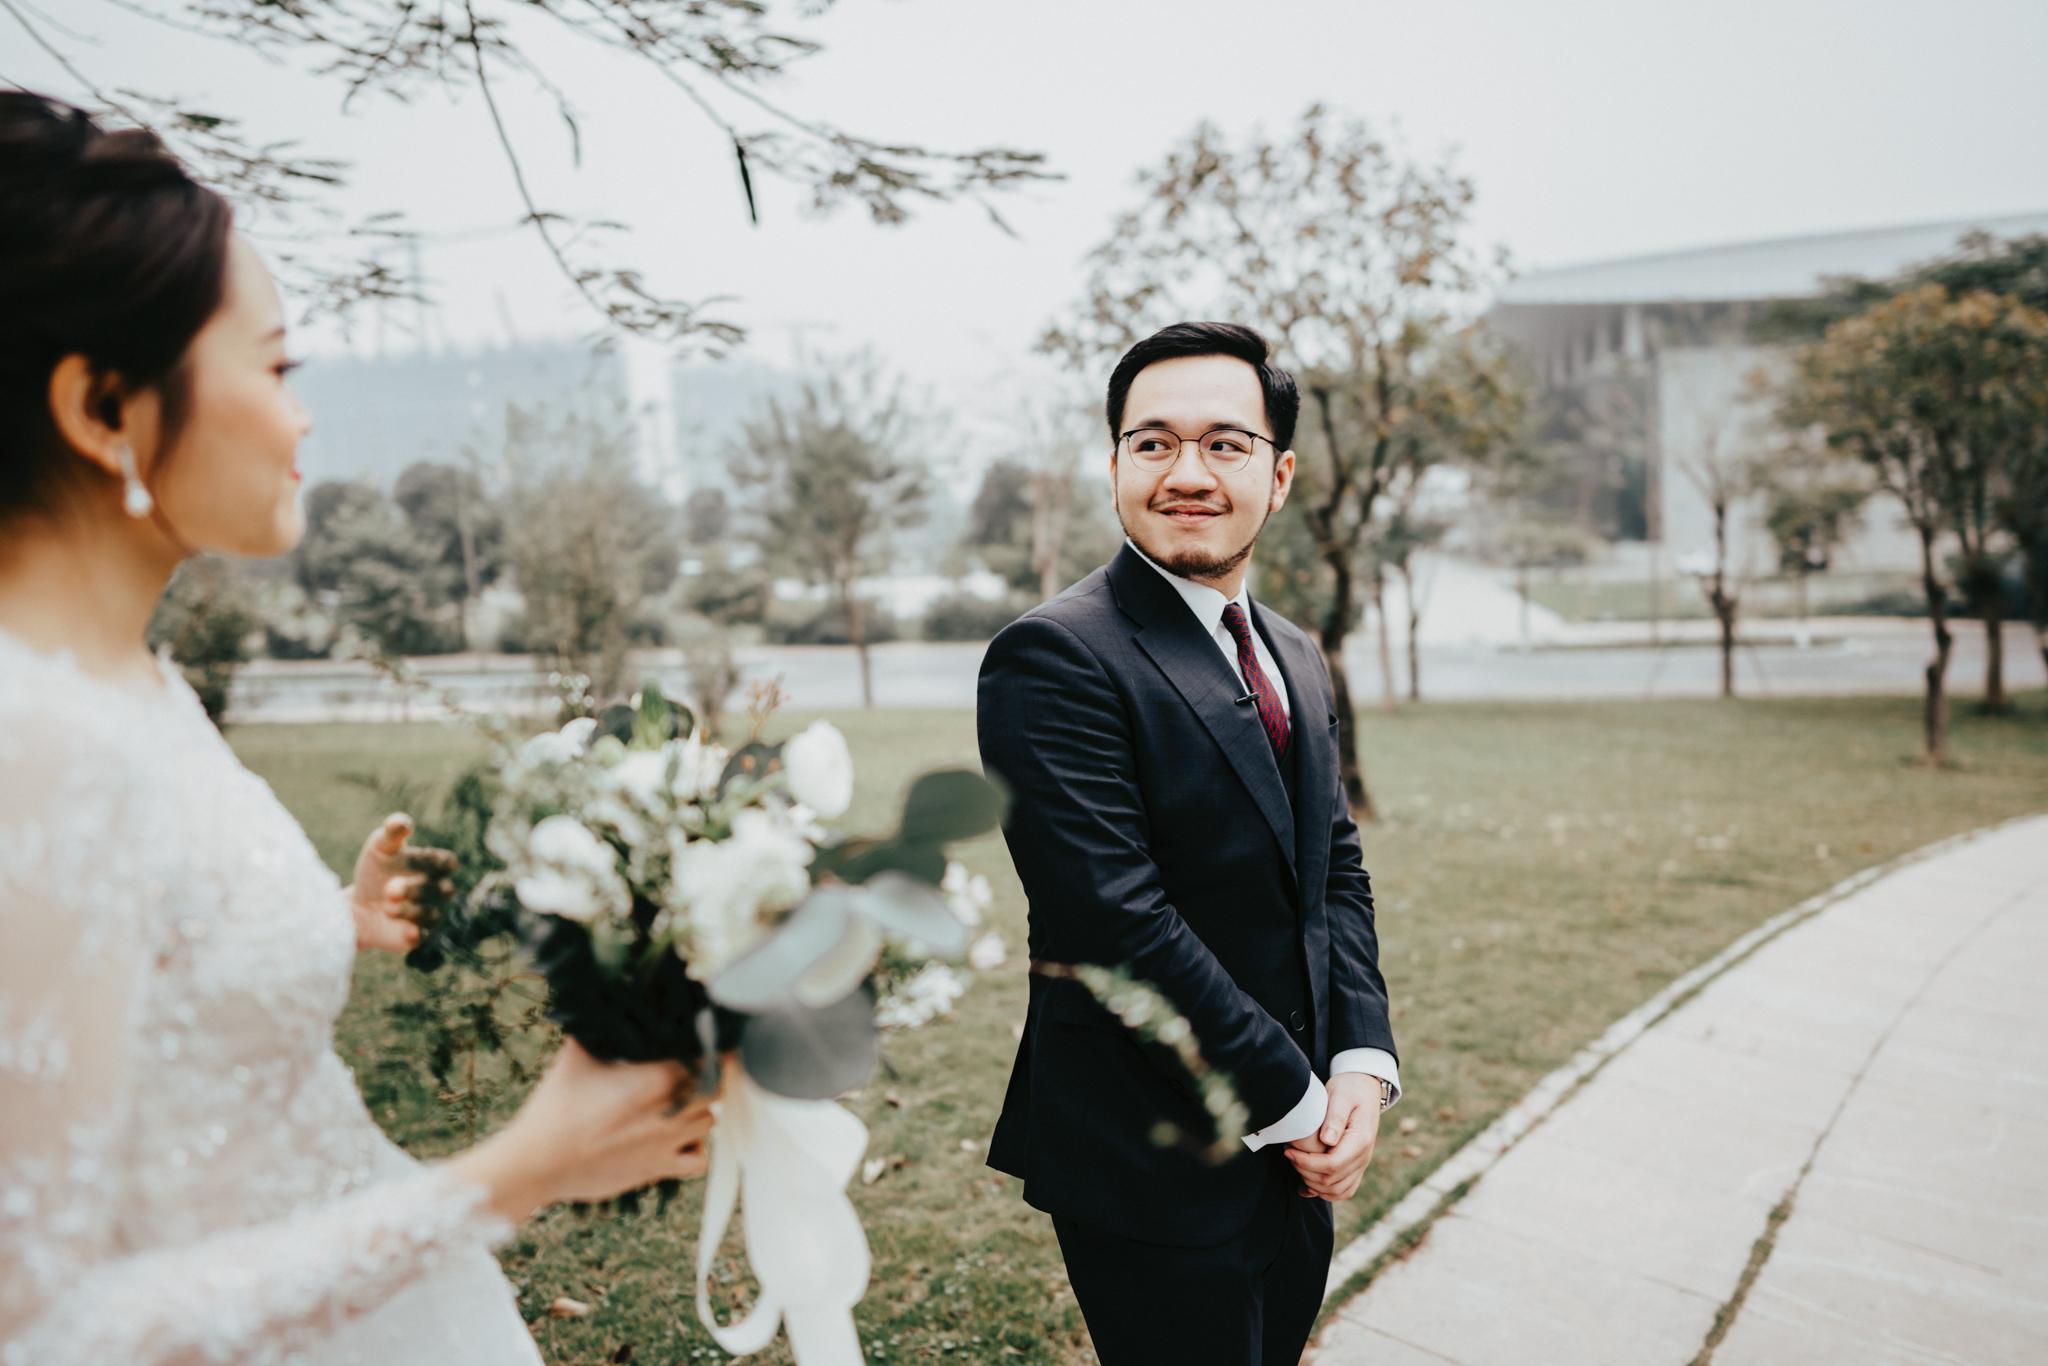 JWMarriott Ha Noi Intimate Wedding of Trang Hi well captured by Hipster Wedding Vietnam Wedding Photographer-35719.jpg